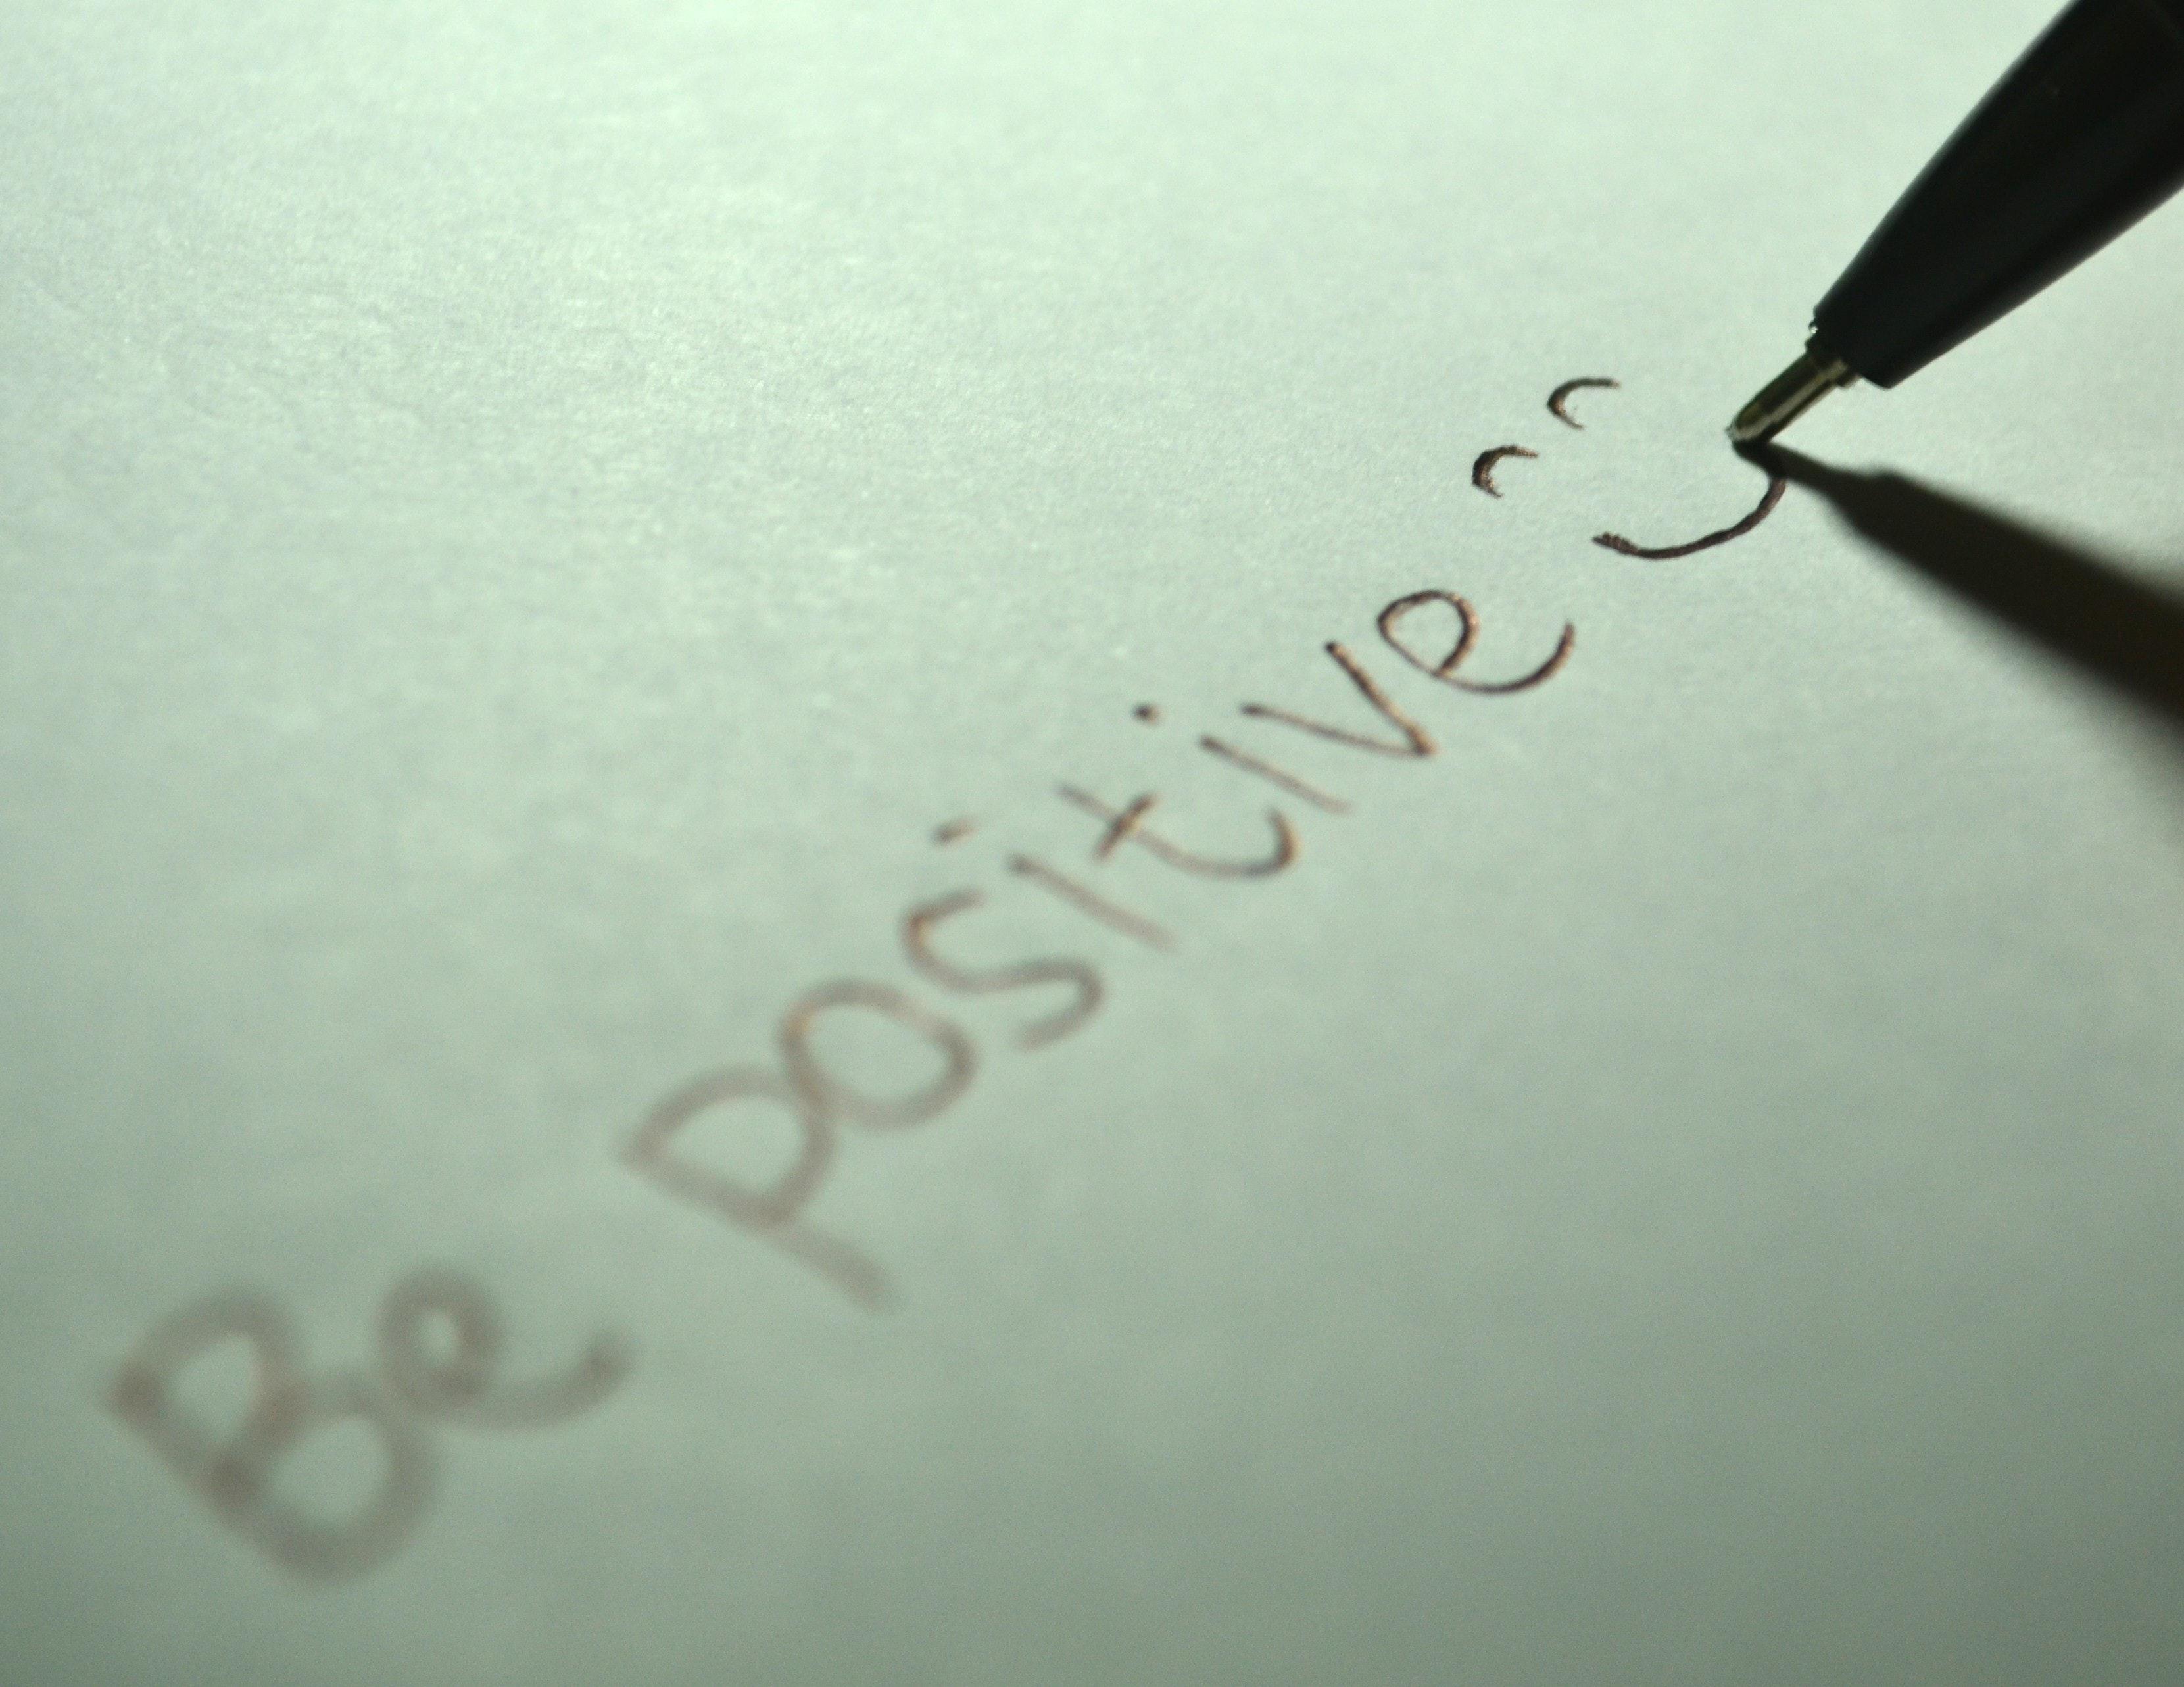 attitude-be-positive-draw-262532.jpg